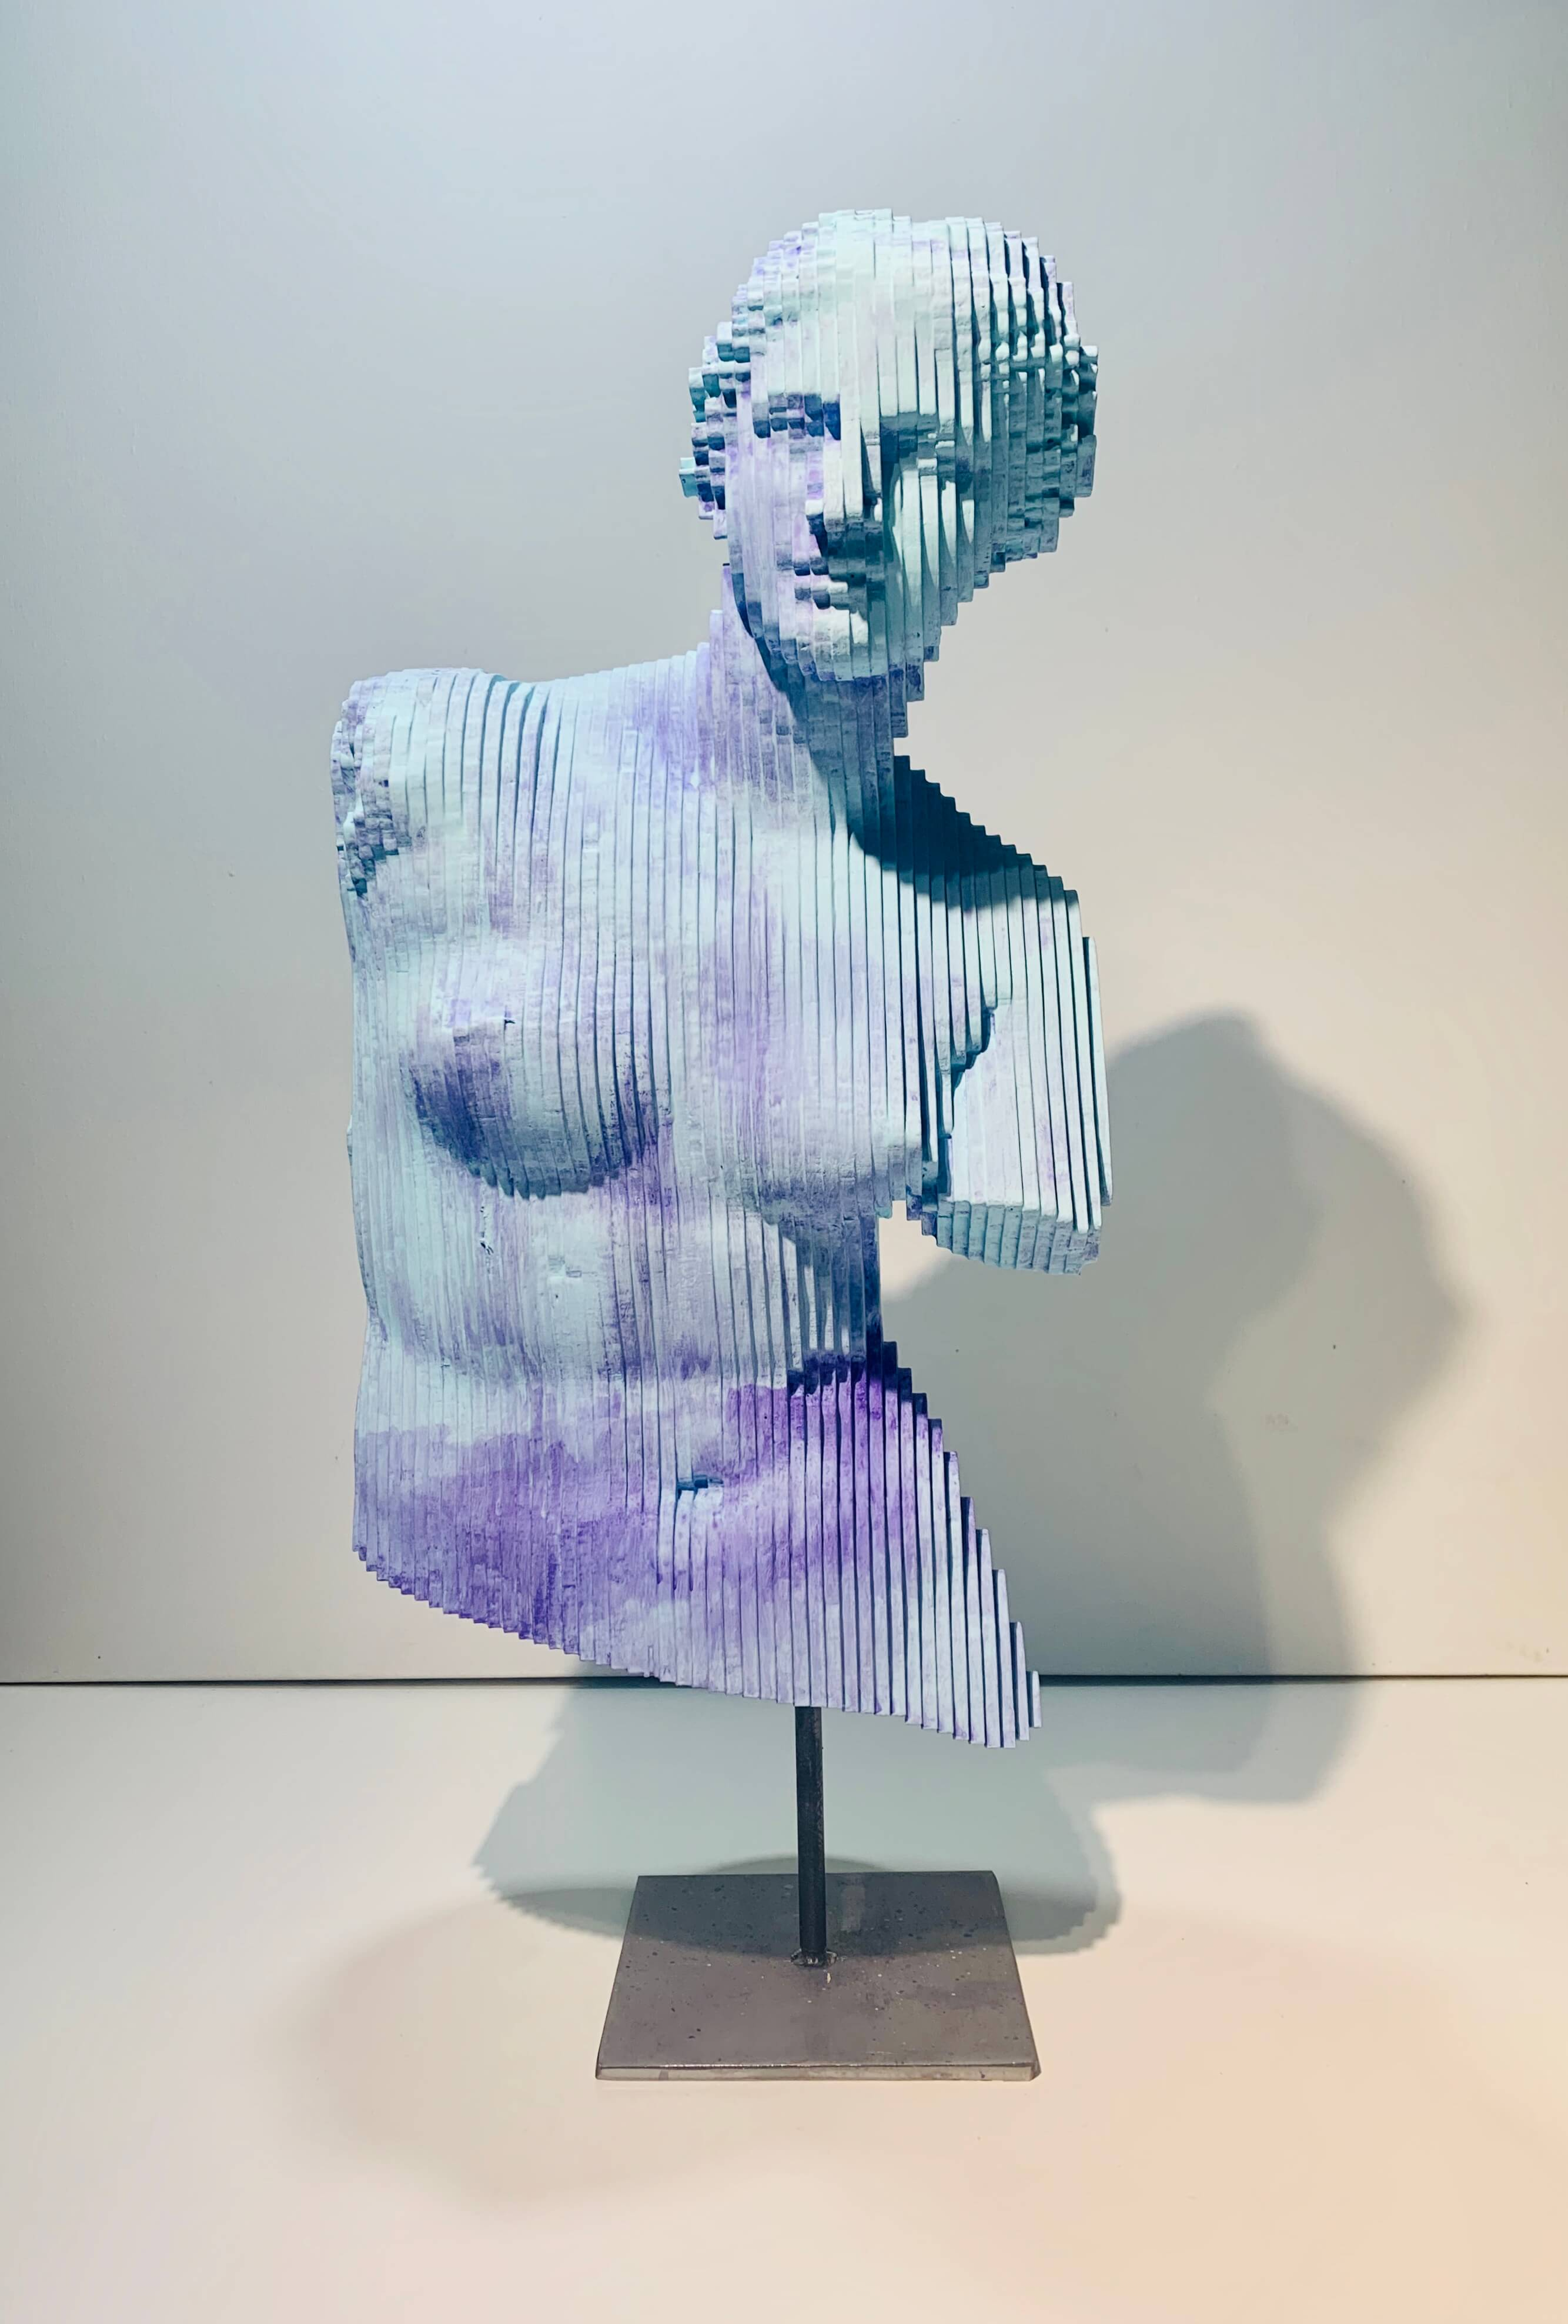 Daniele-Fortuna-Venus-of-Milo-40x27x17cm-wood-2020.-